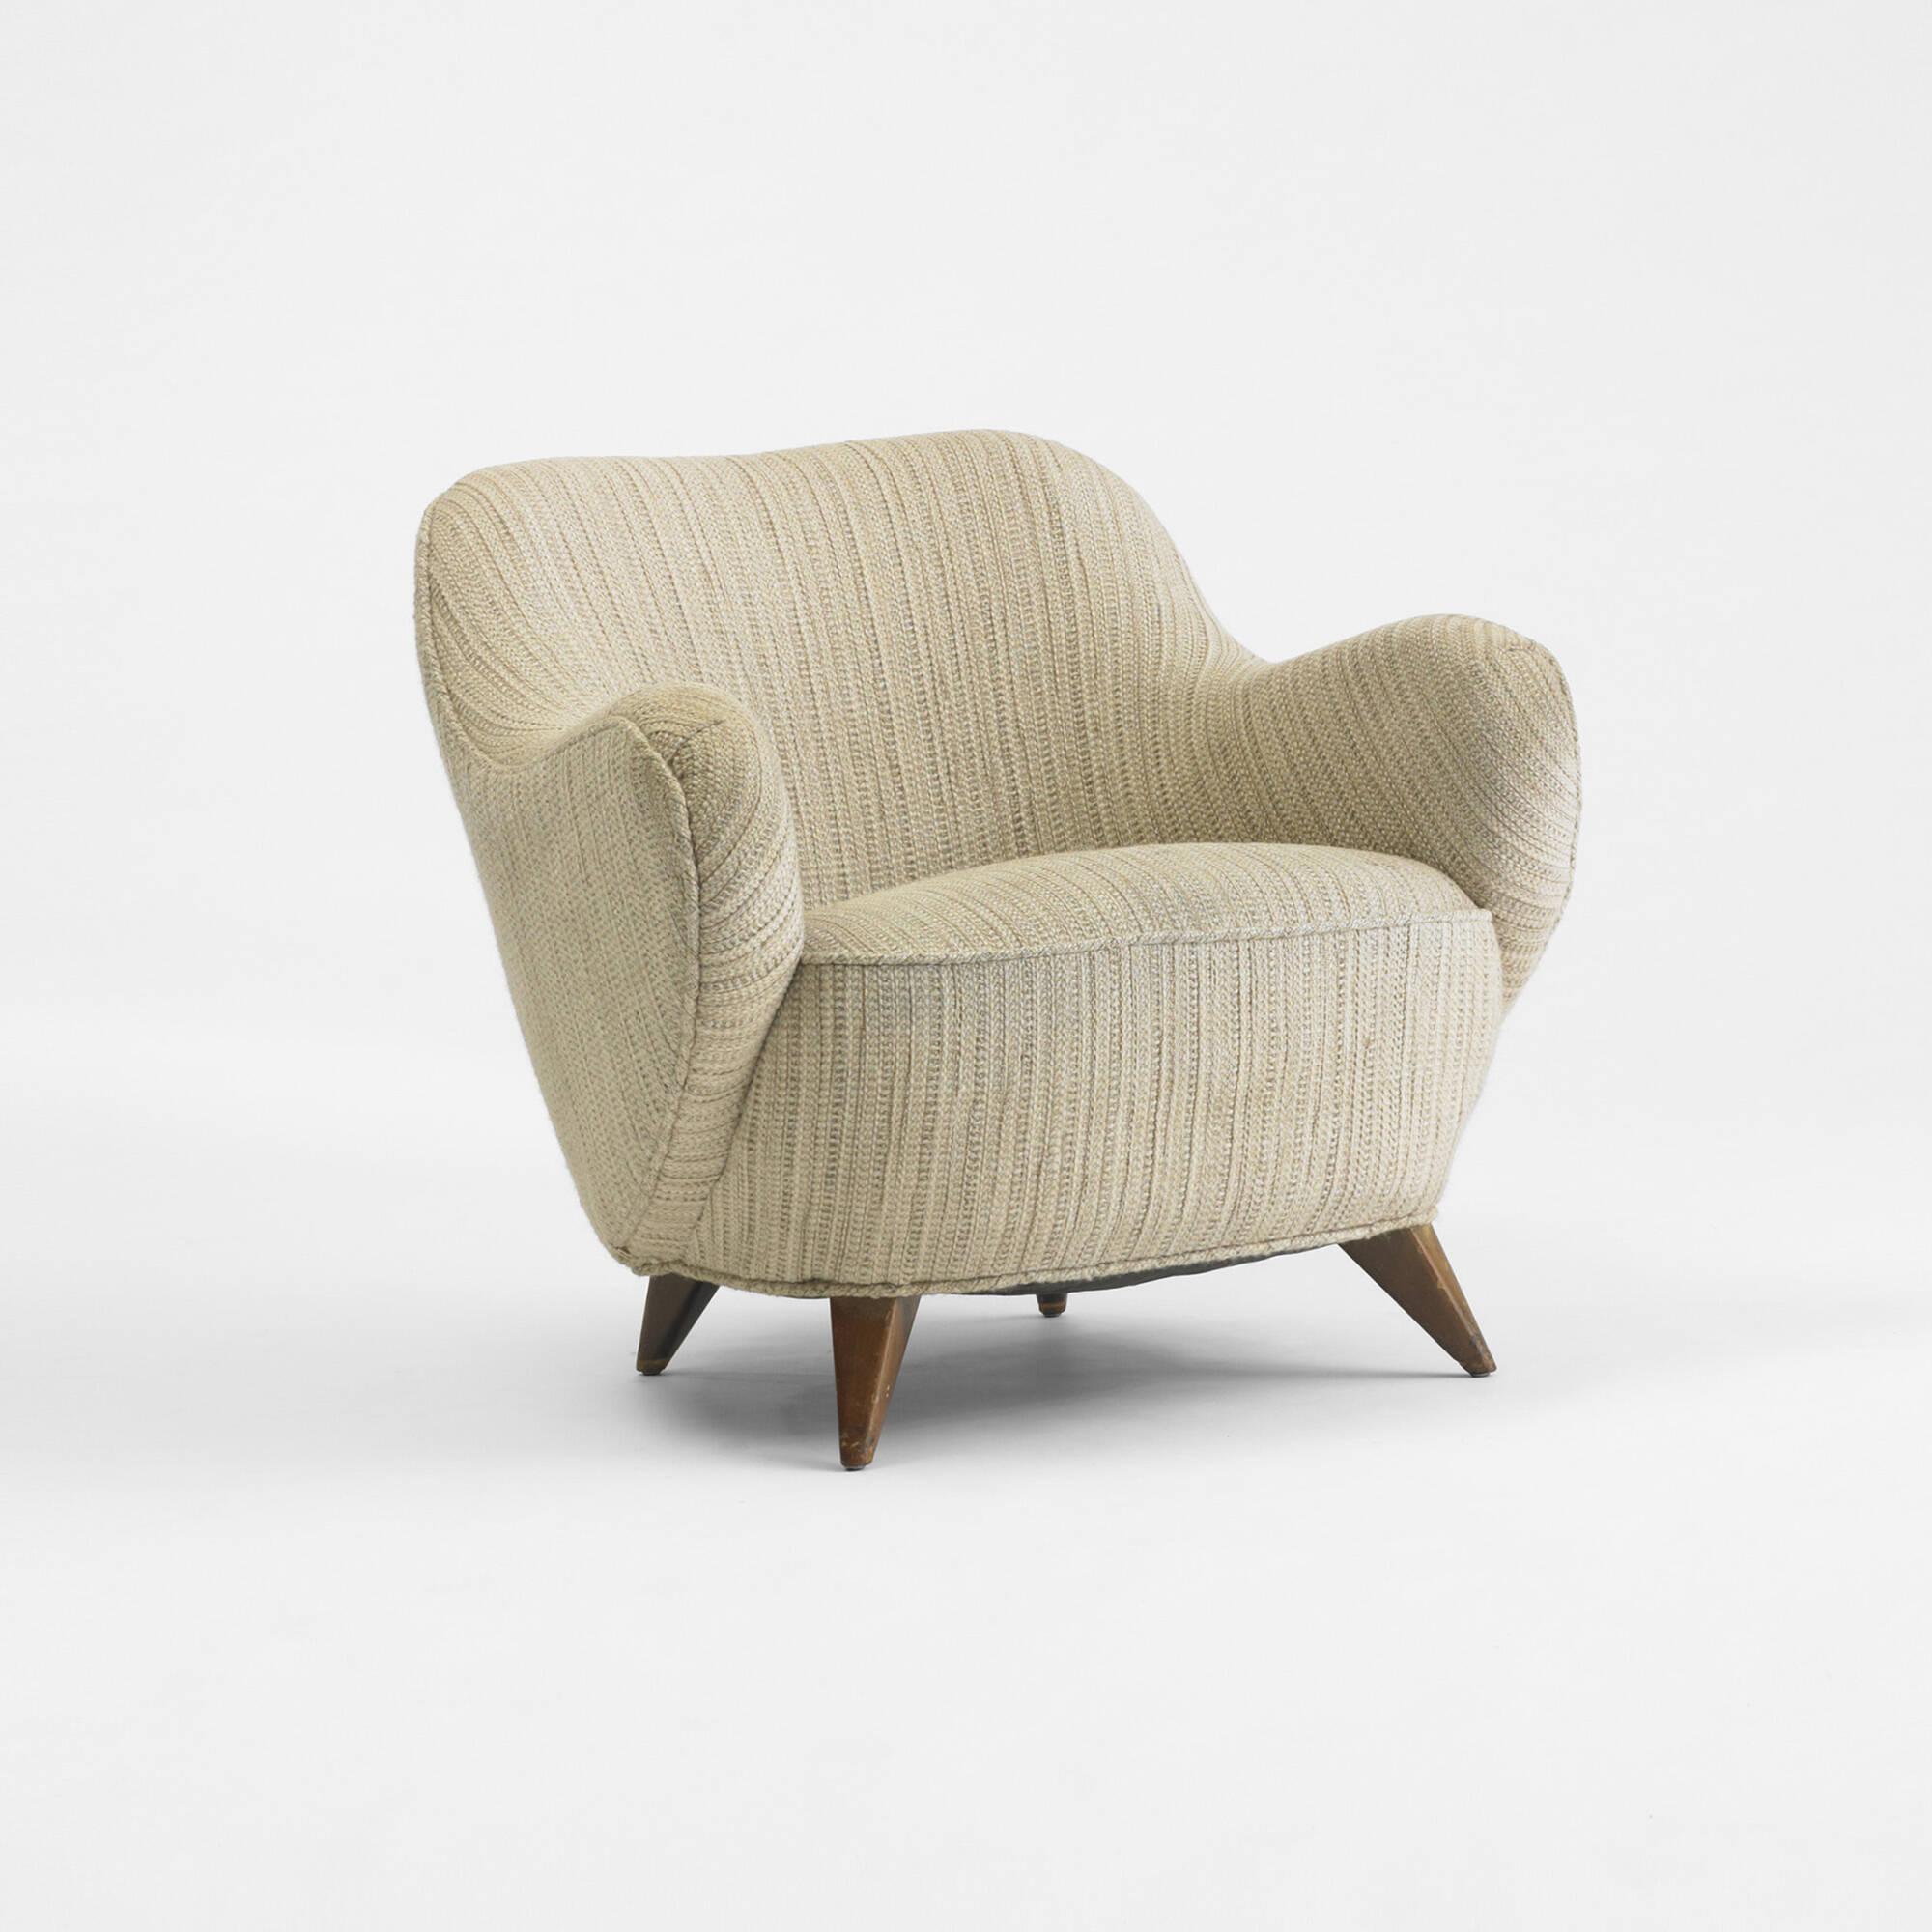 Gentil 214: Vladimir Kagan / Barrel Lounge Chair From A Manhattan Interior (1 Of 3